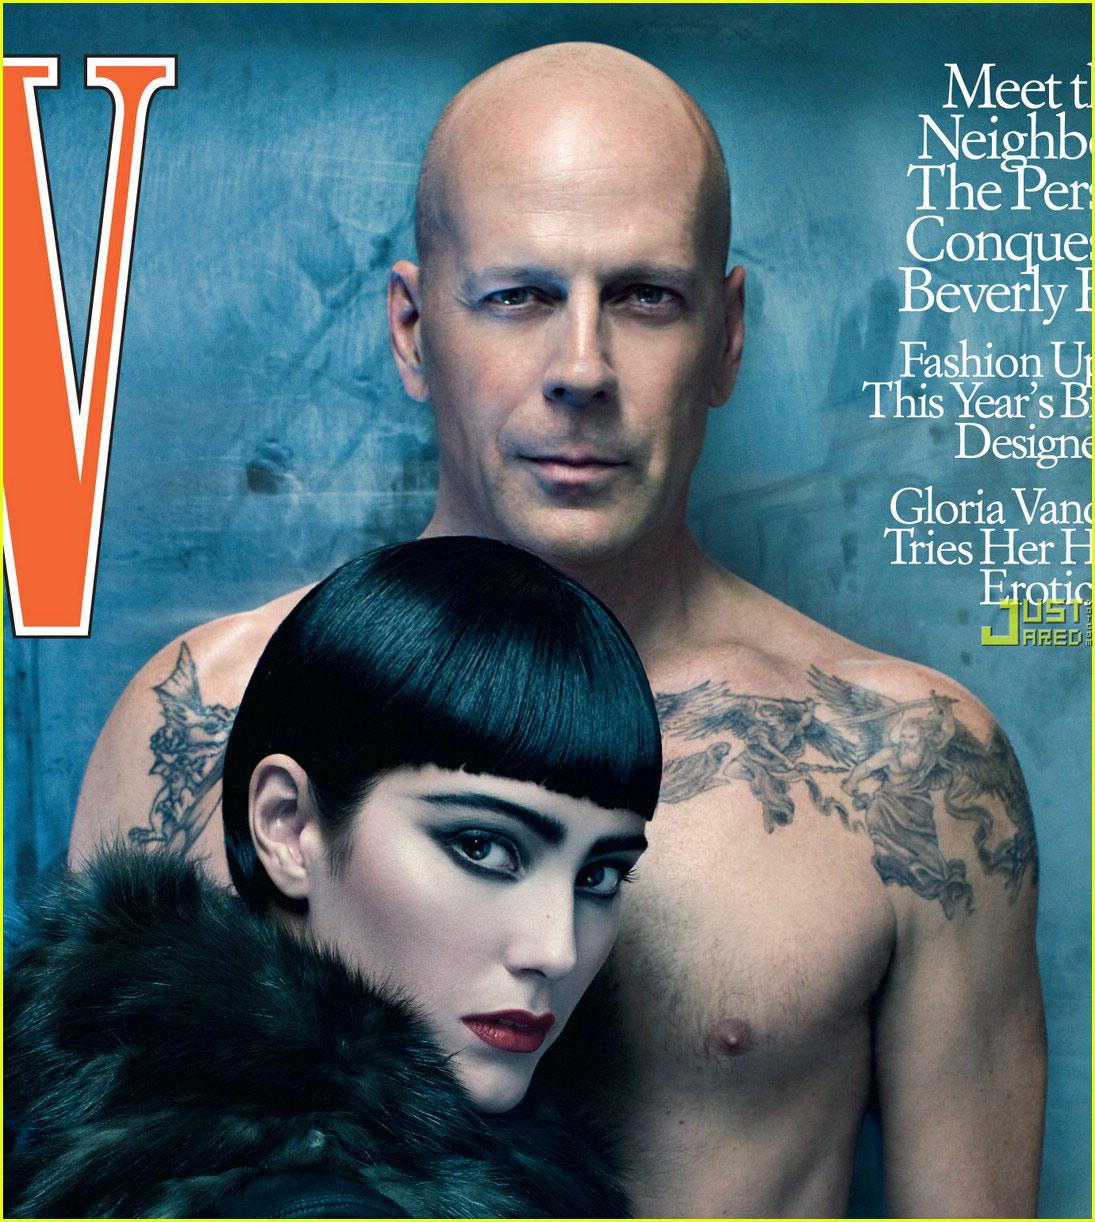 bruce willis and emma heming photo shoot Bruce Willis Feud